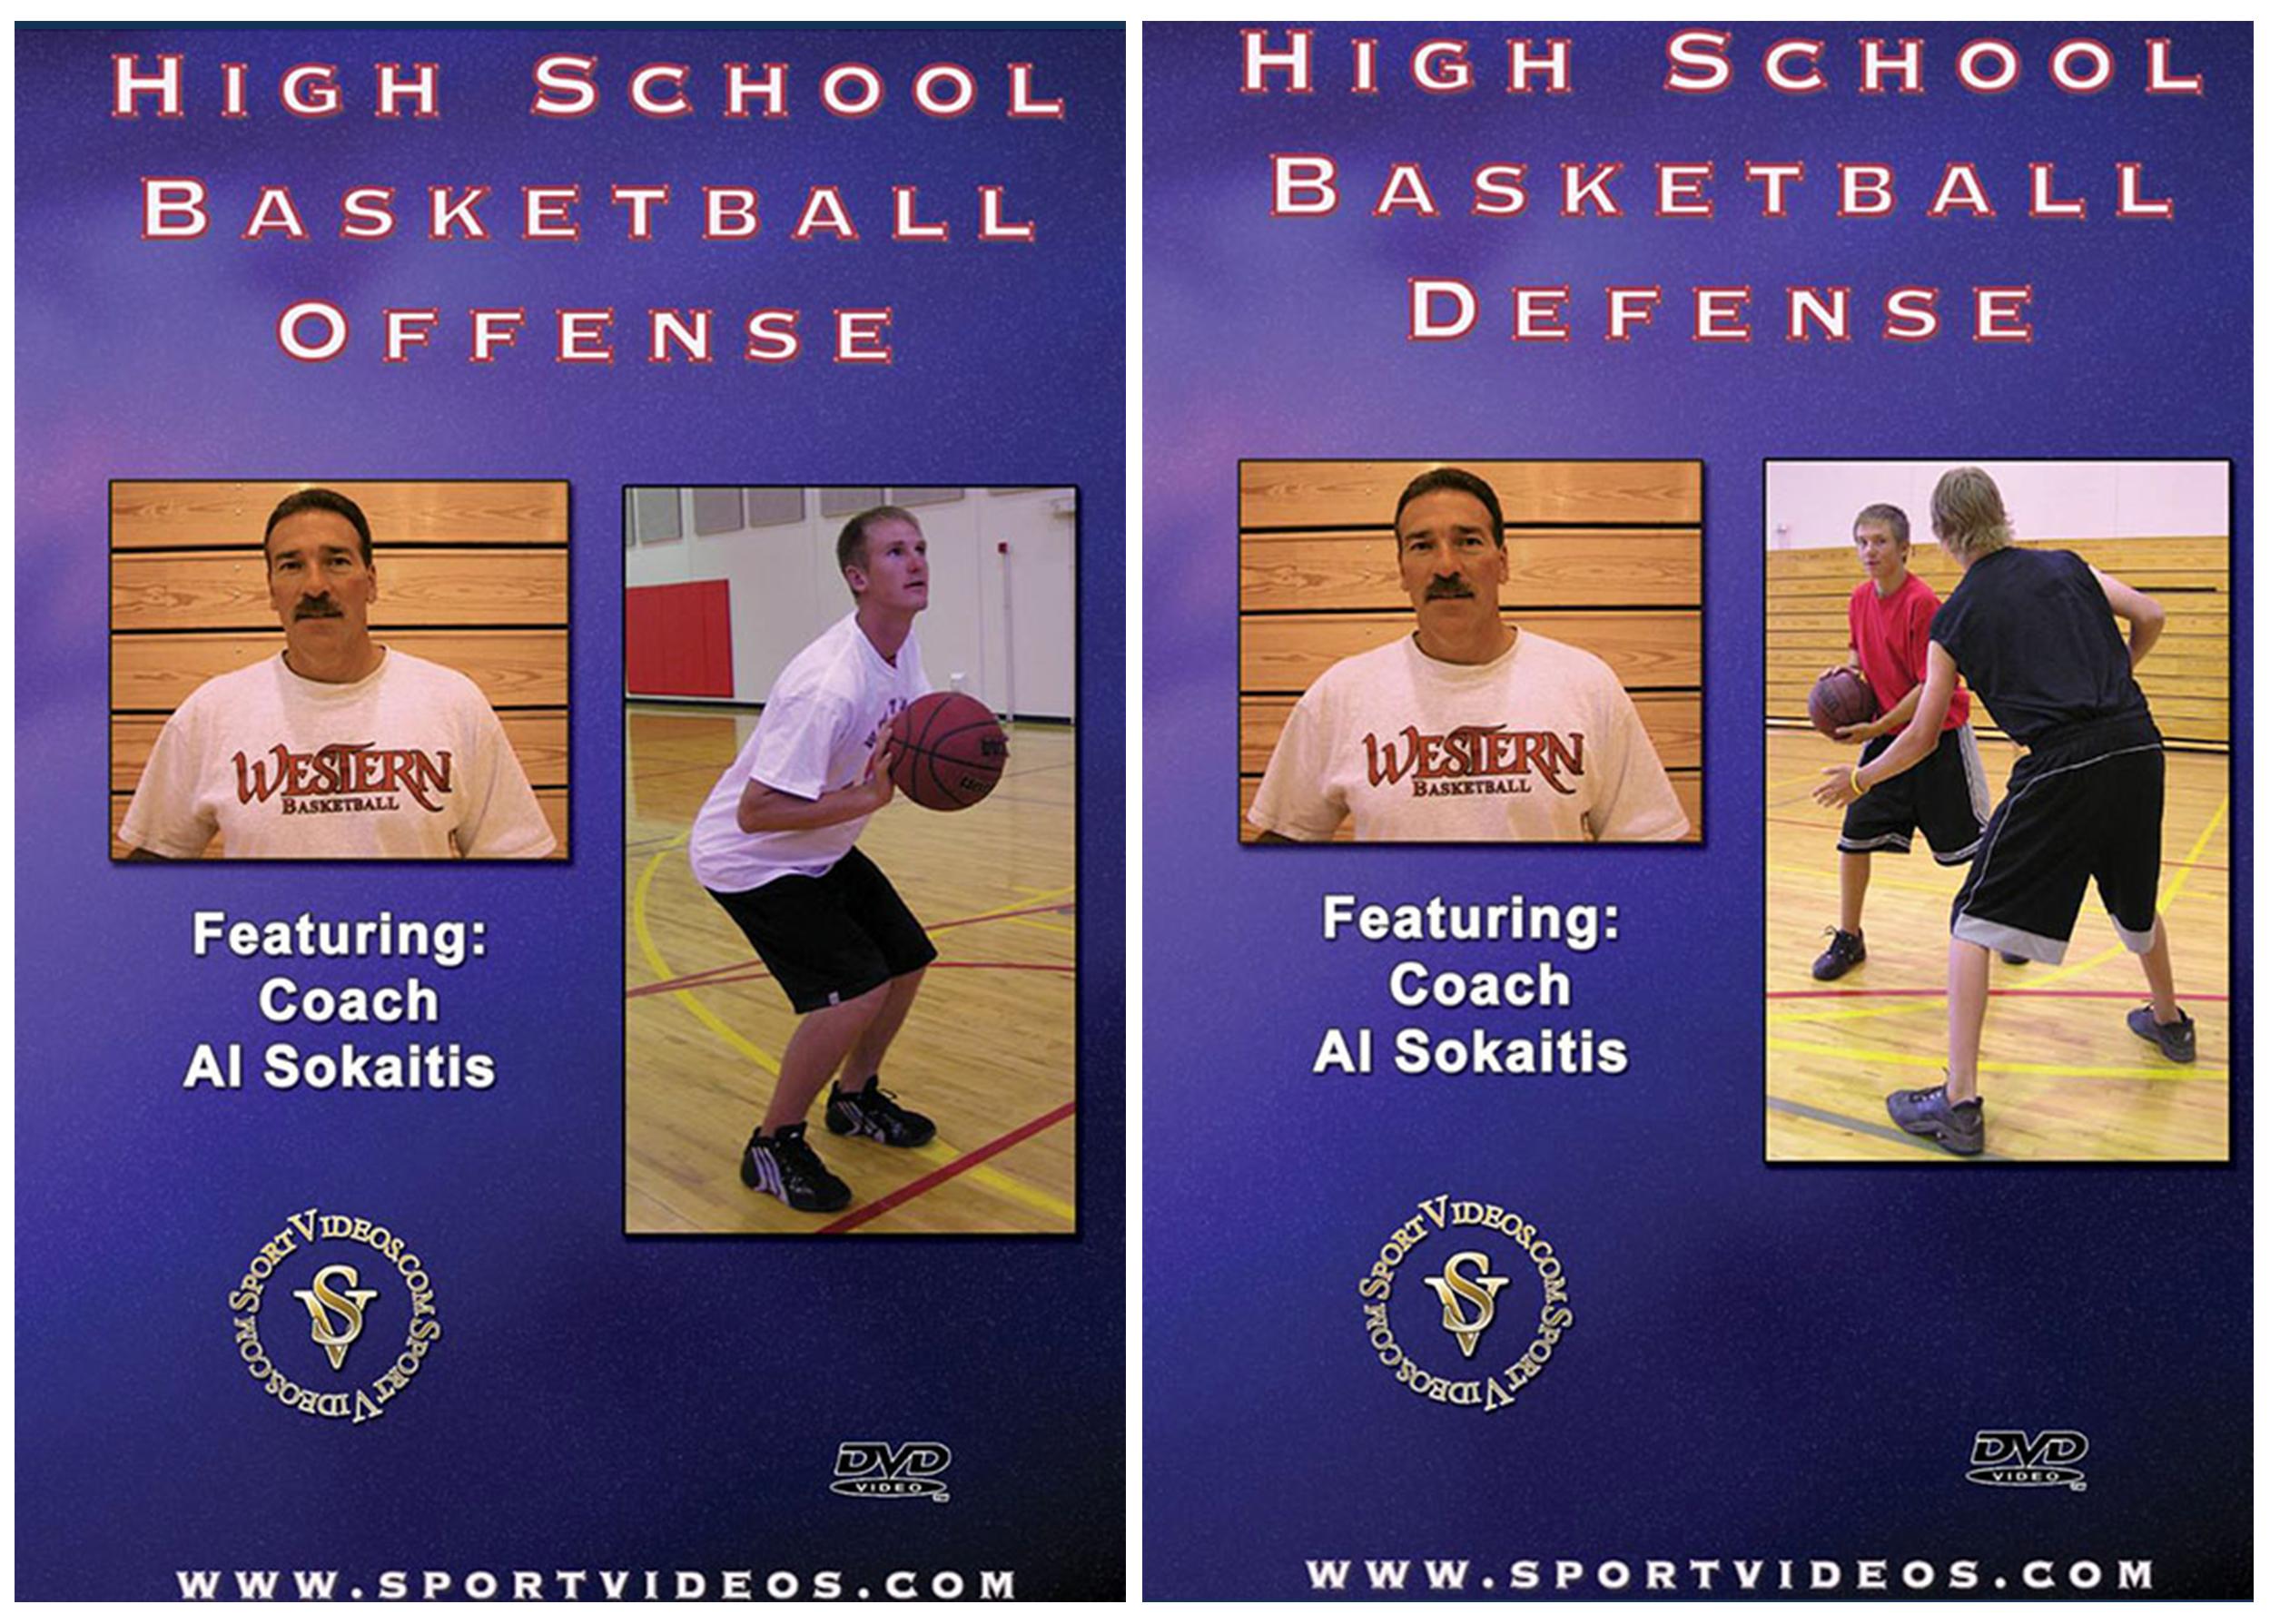 High School Basketball 2 DVD Set